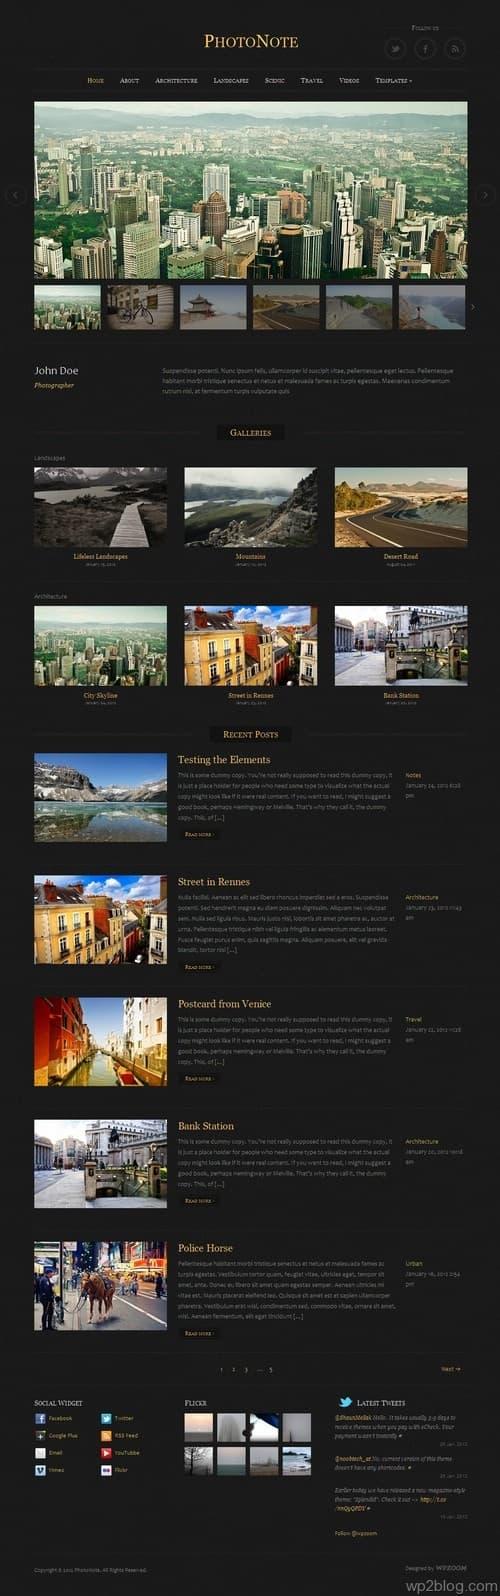 PhotoNote WordPress Theme